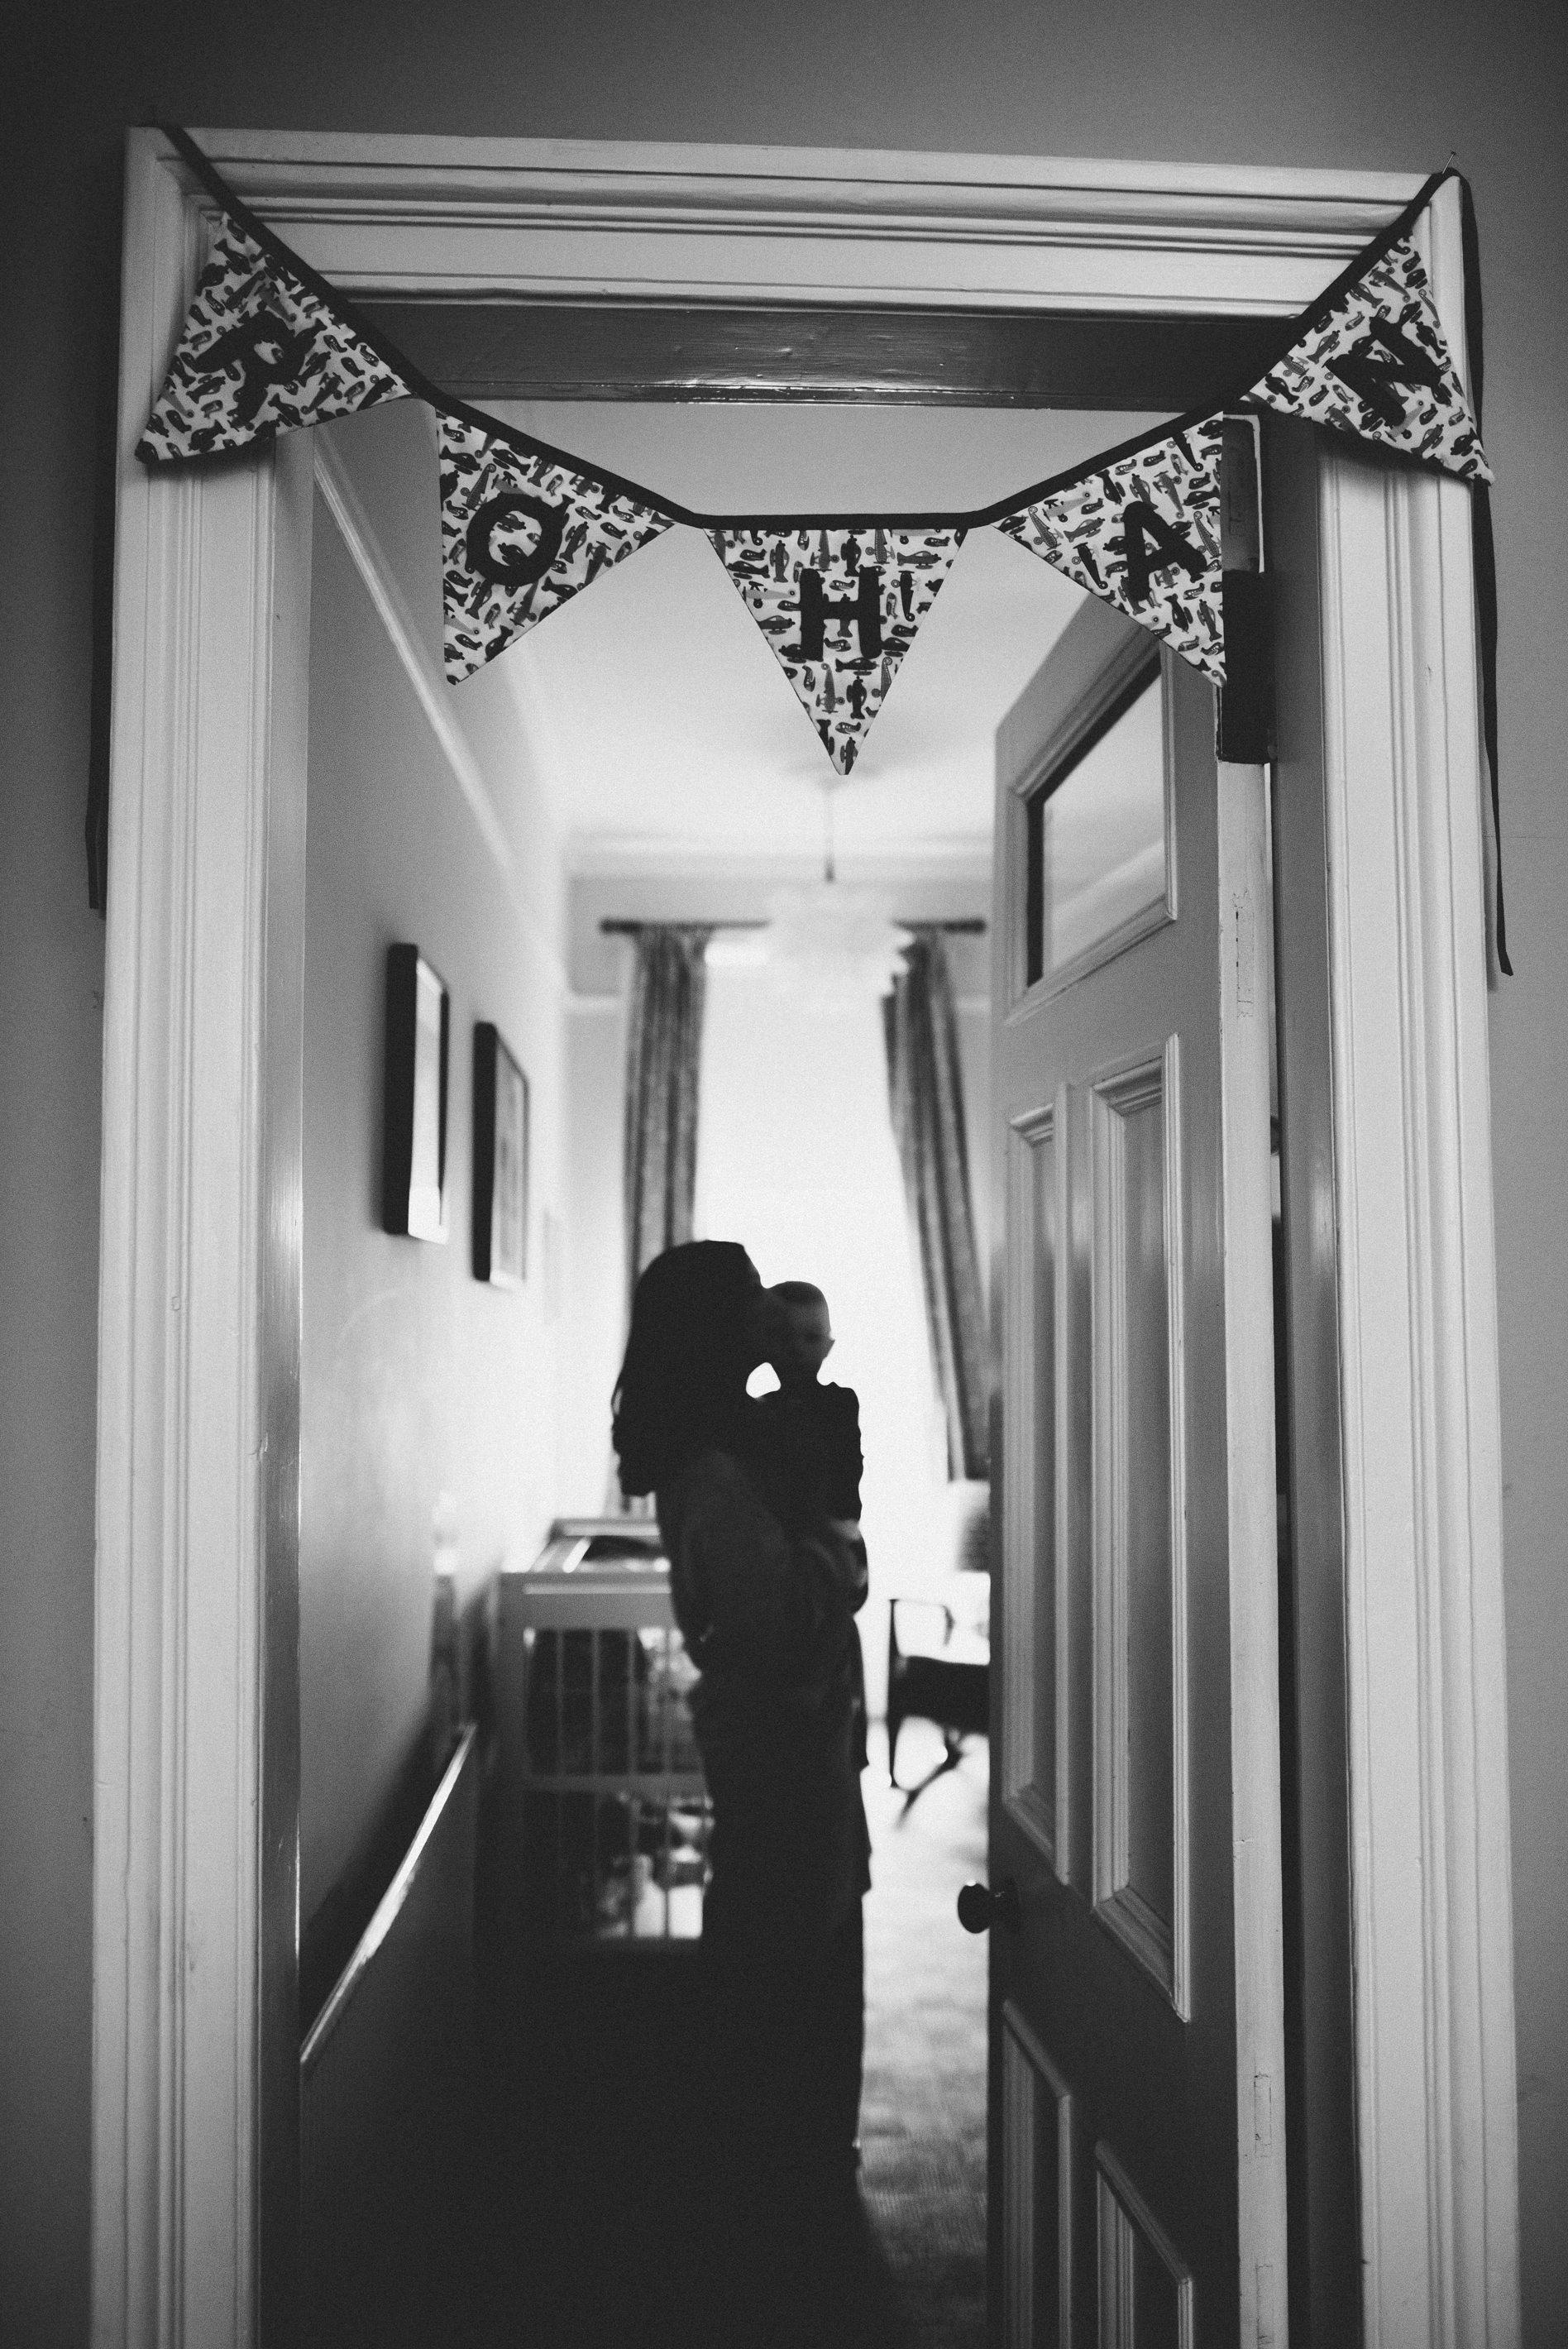 0155-LISA-DEVINE-PHOTOGRAPHY-ALTERNATIVE-WEDDING-PHOTOGRAPHY-SCOTLAND-DESTINATION-WEDDINGS-GLASGOW-WEDDINGS-COOL-WEDDINGS-STYLISH-WEDDINGS.JPG